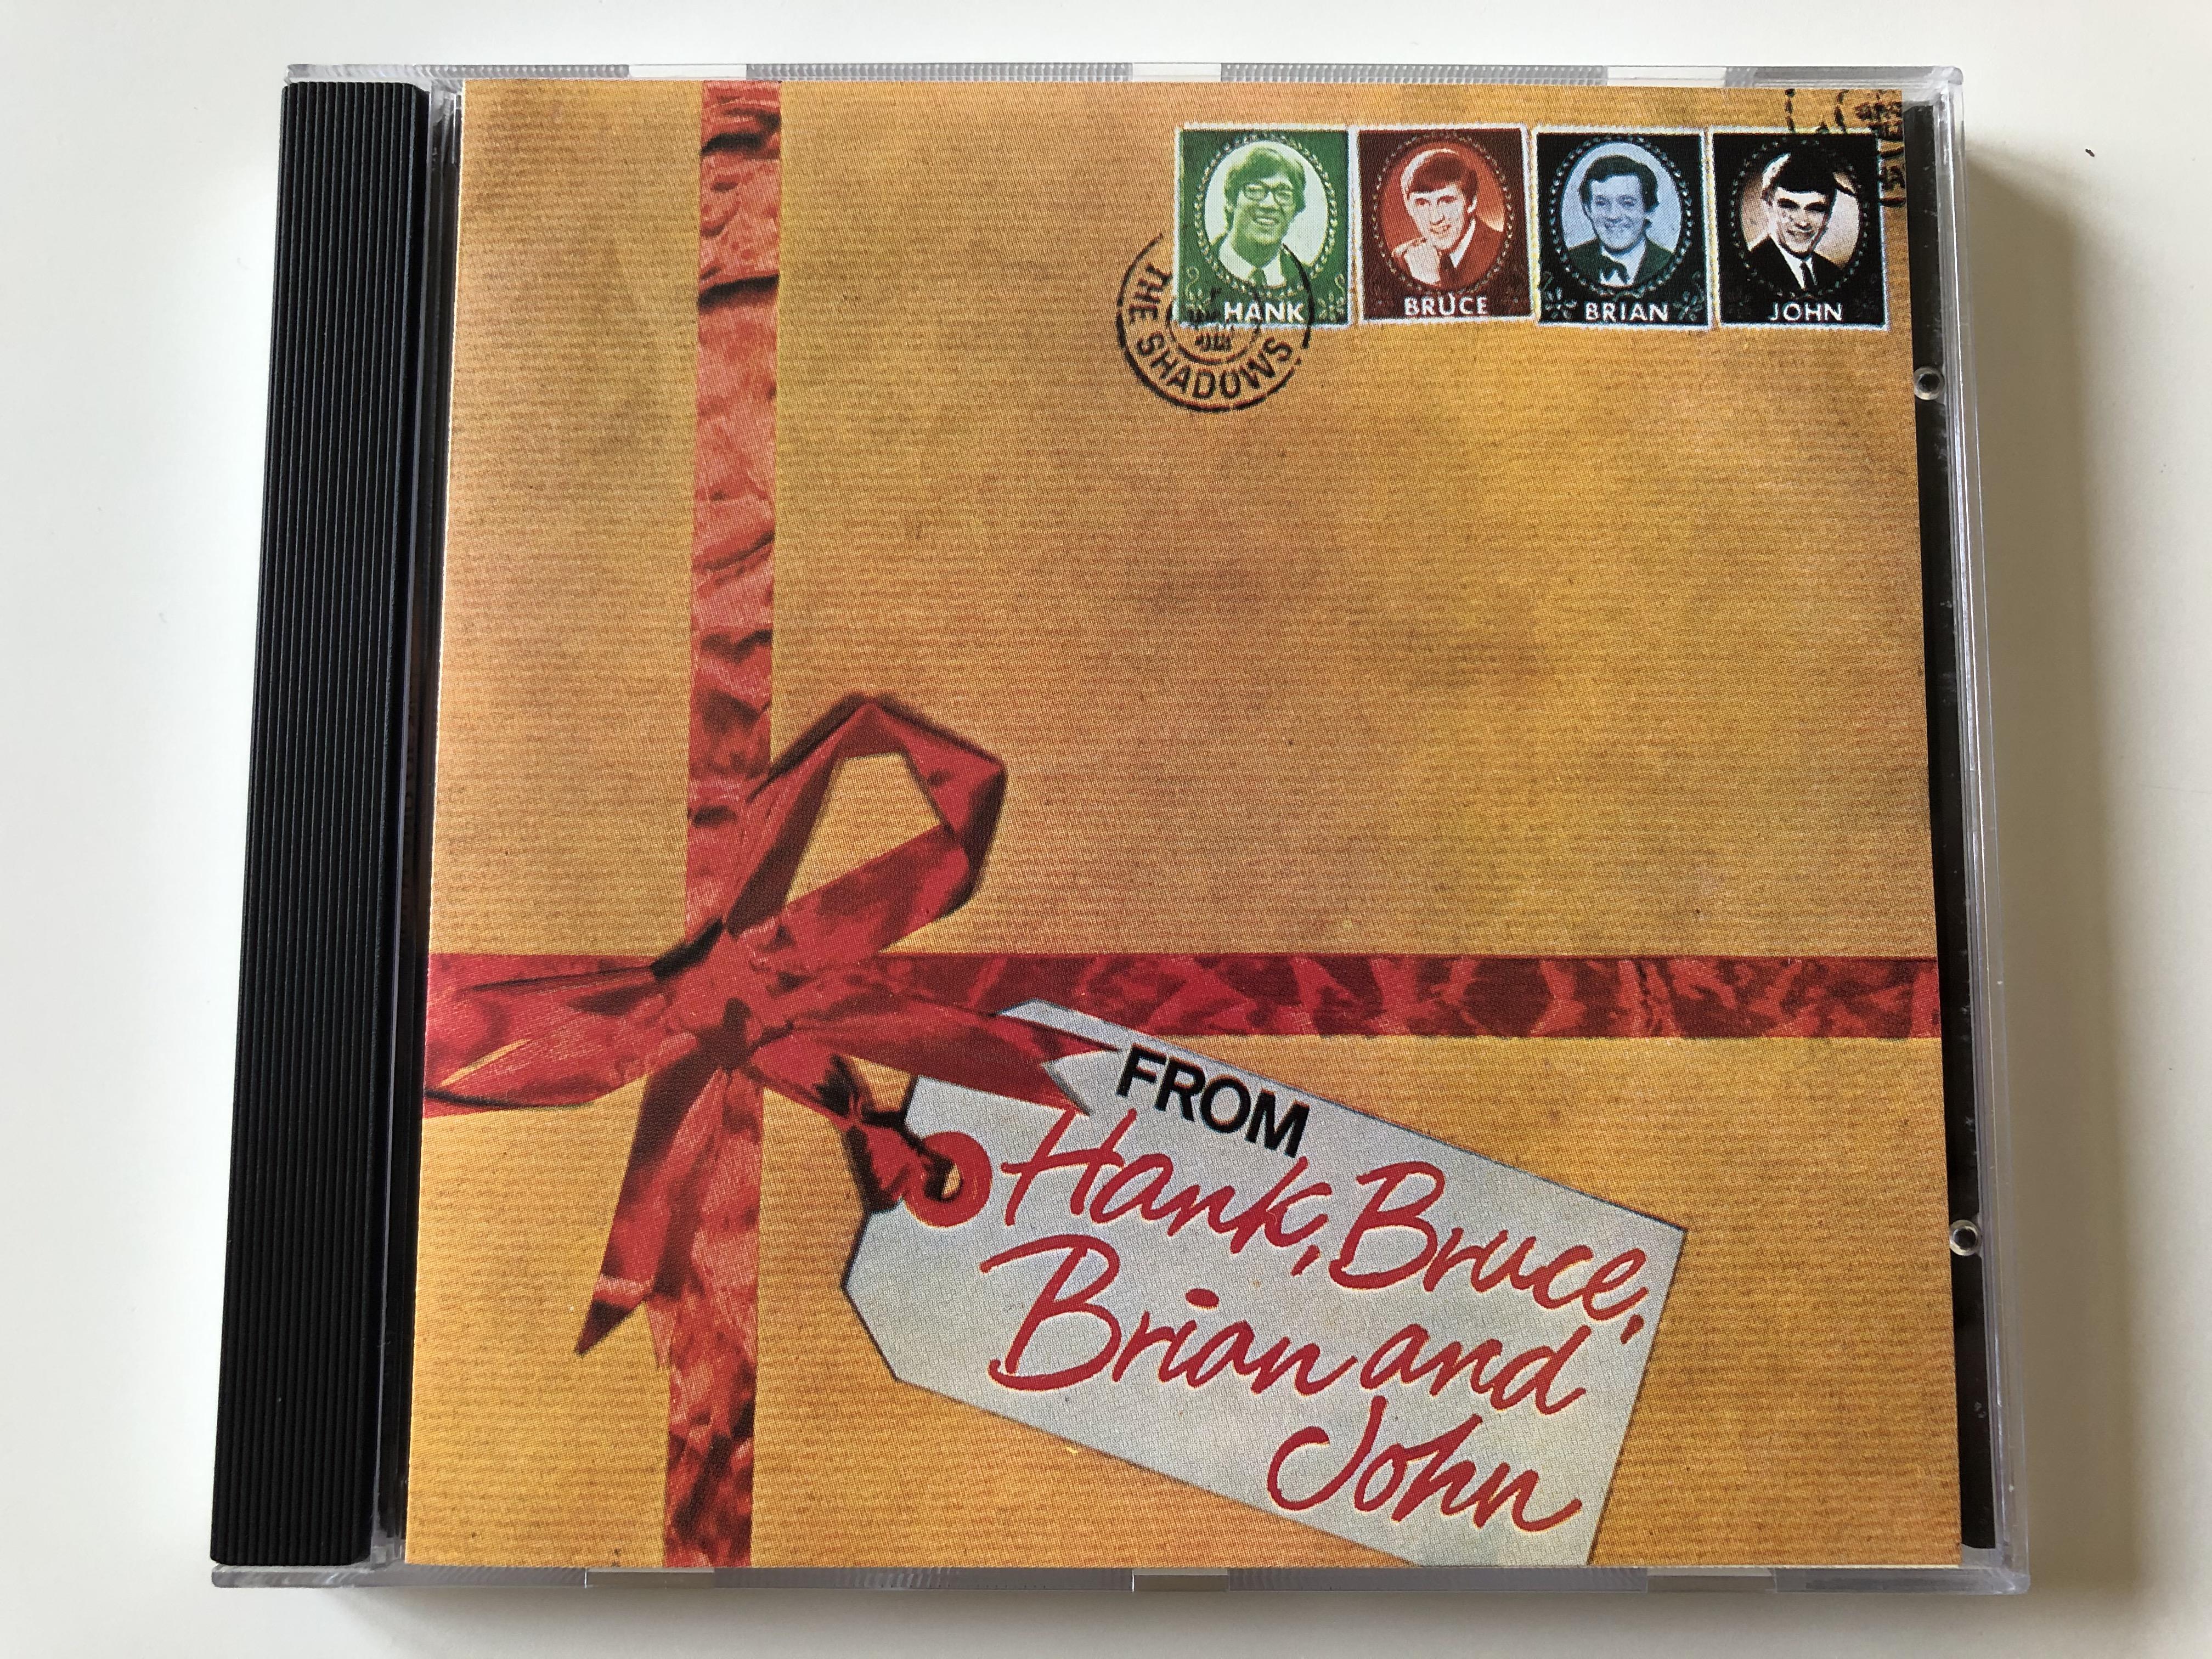 the-shadows-from-hank-brian-bruce-john-bgo-records-audio-cd-1990-bgocd20-1-.jpg